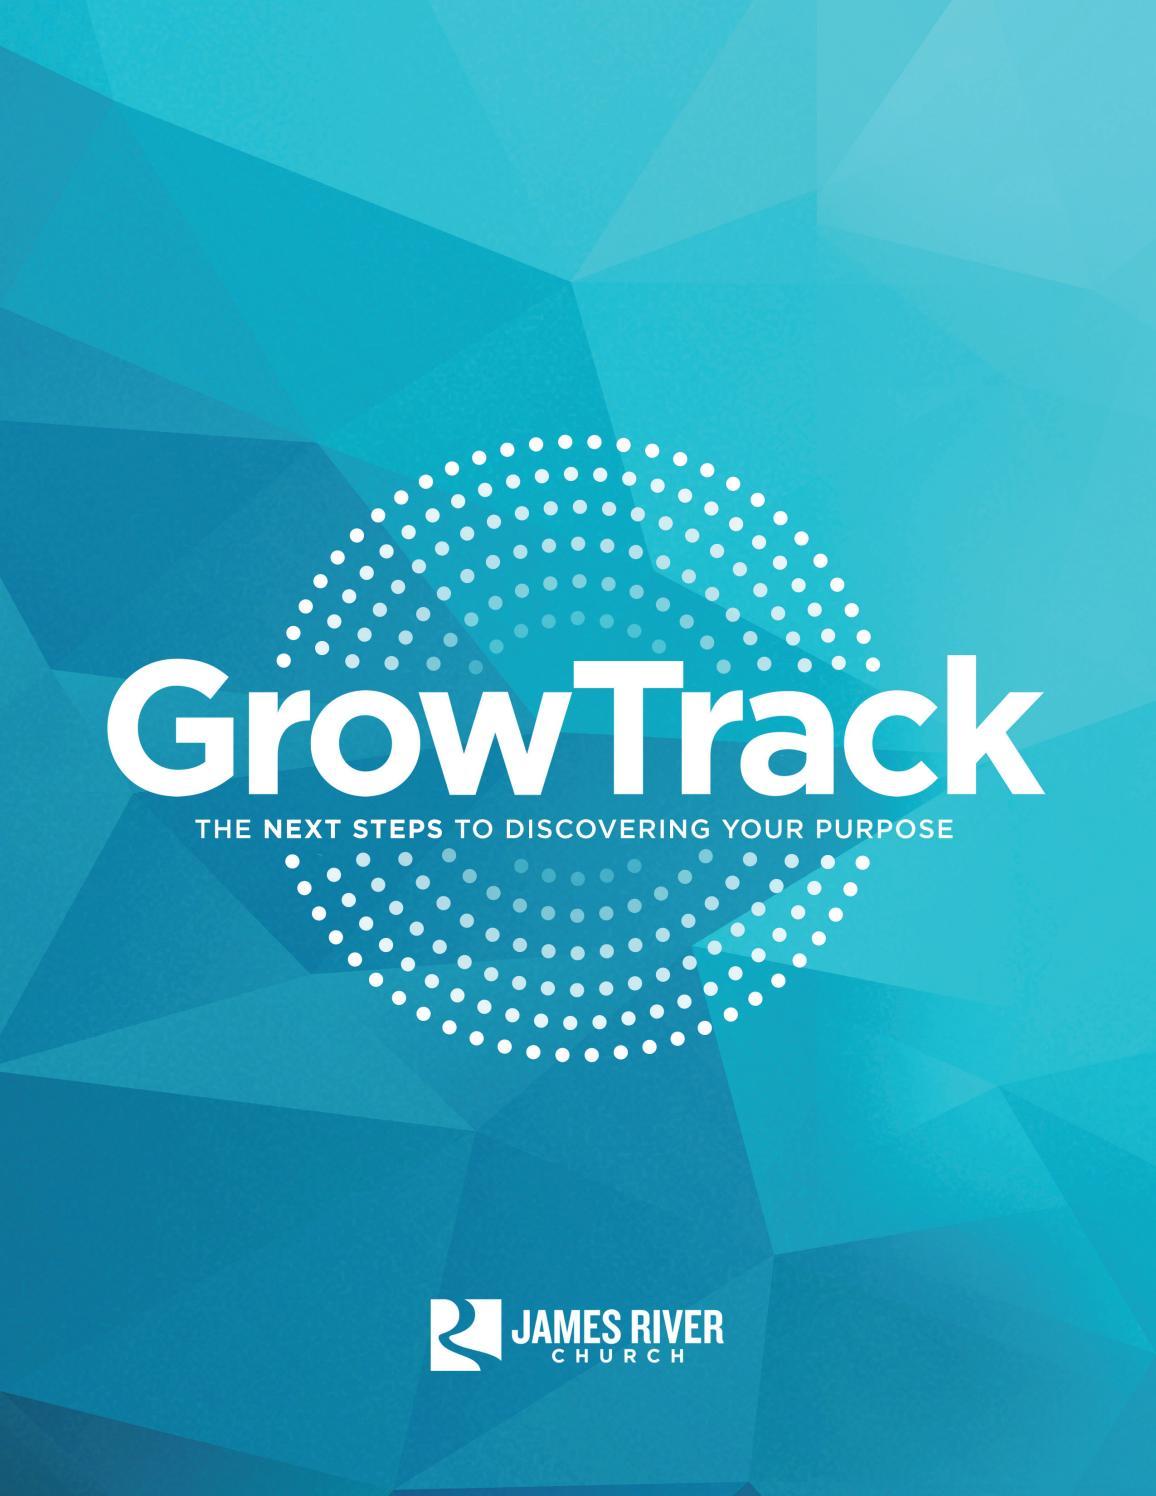 Jrcgrow Track Manual By James River Church Issuu